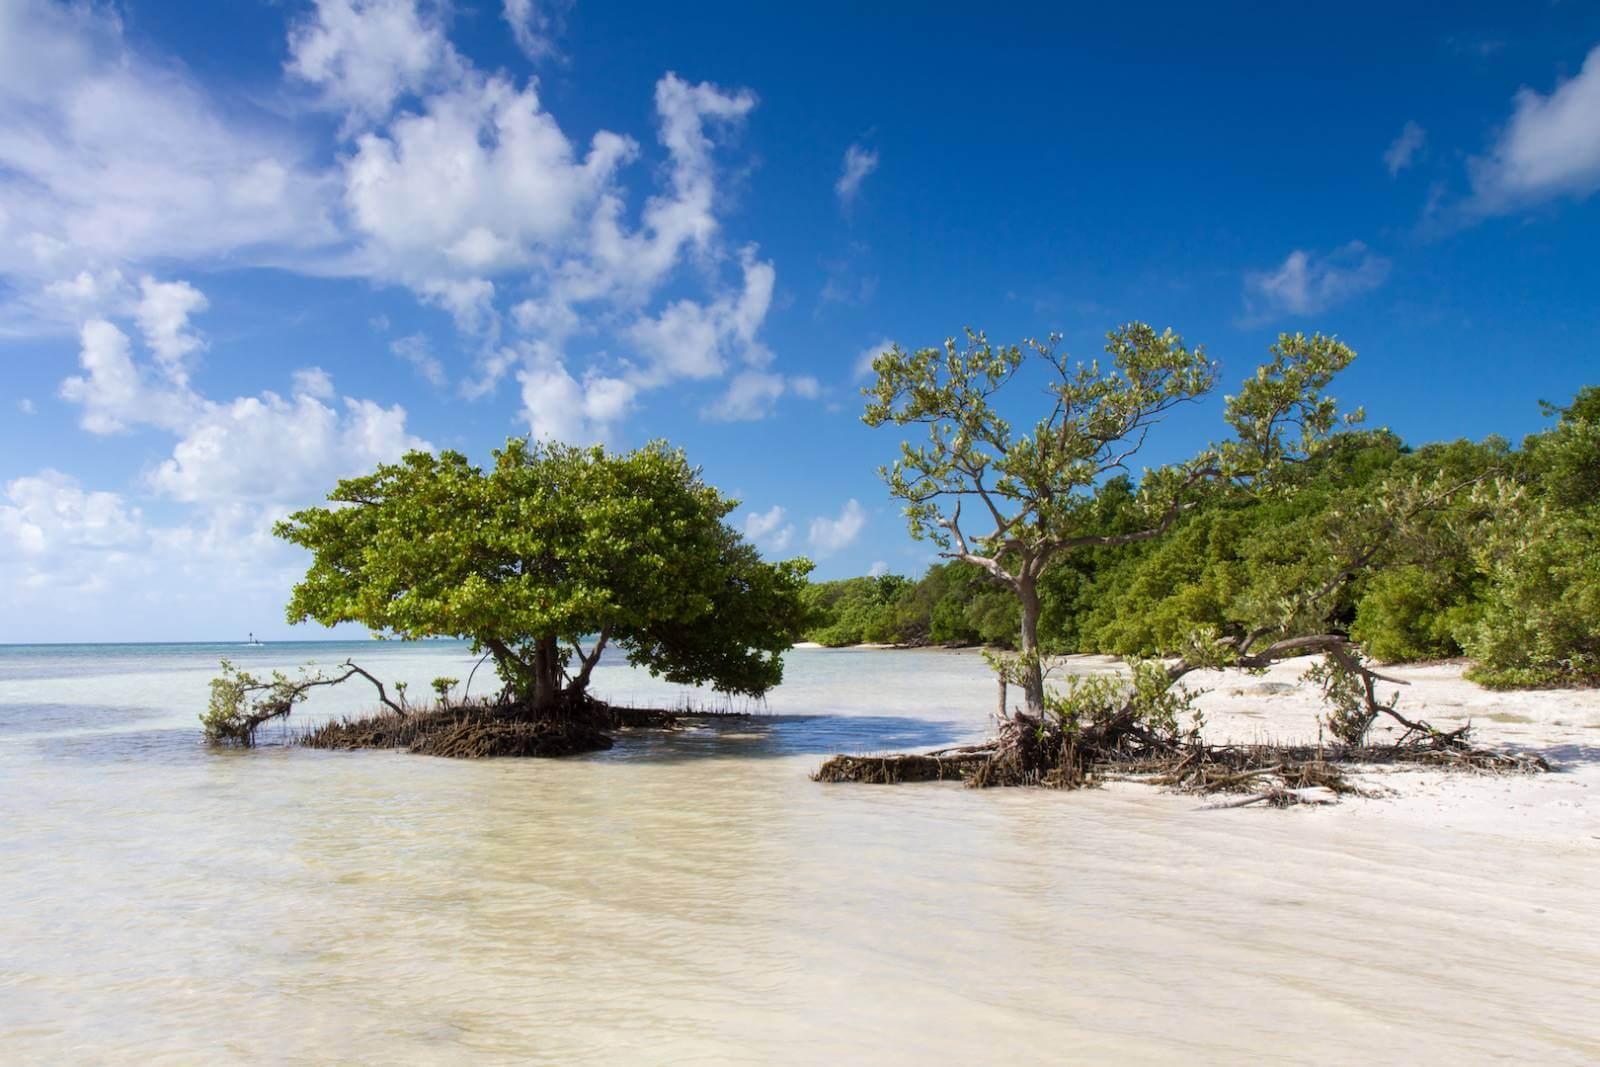 Get back to nature by exploring Ten Thousand Islands National Wildlife Refuge. Soak up uninhabited isles via kayaking, canoe, or boat. Naples, Florida. Must Do Visitor Guides, MustDo.com.